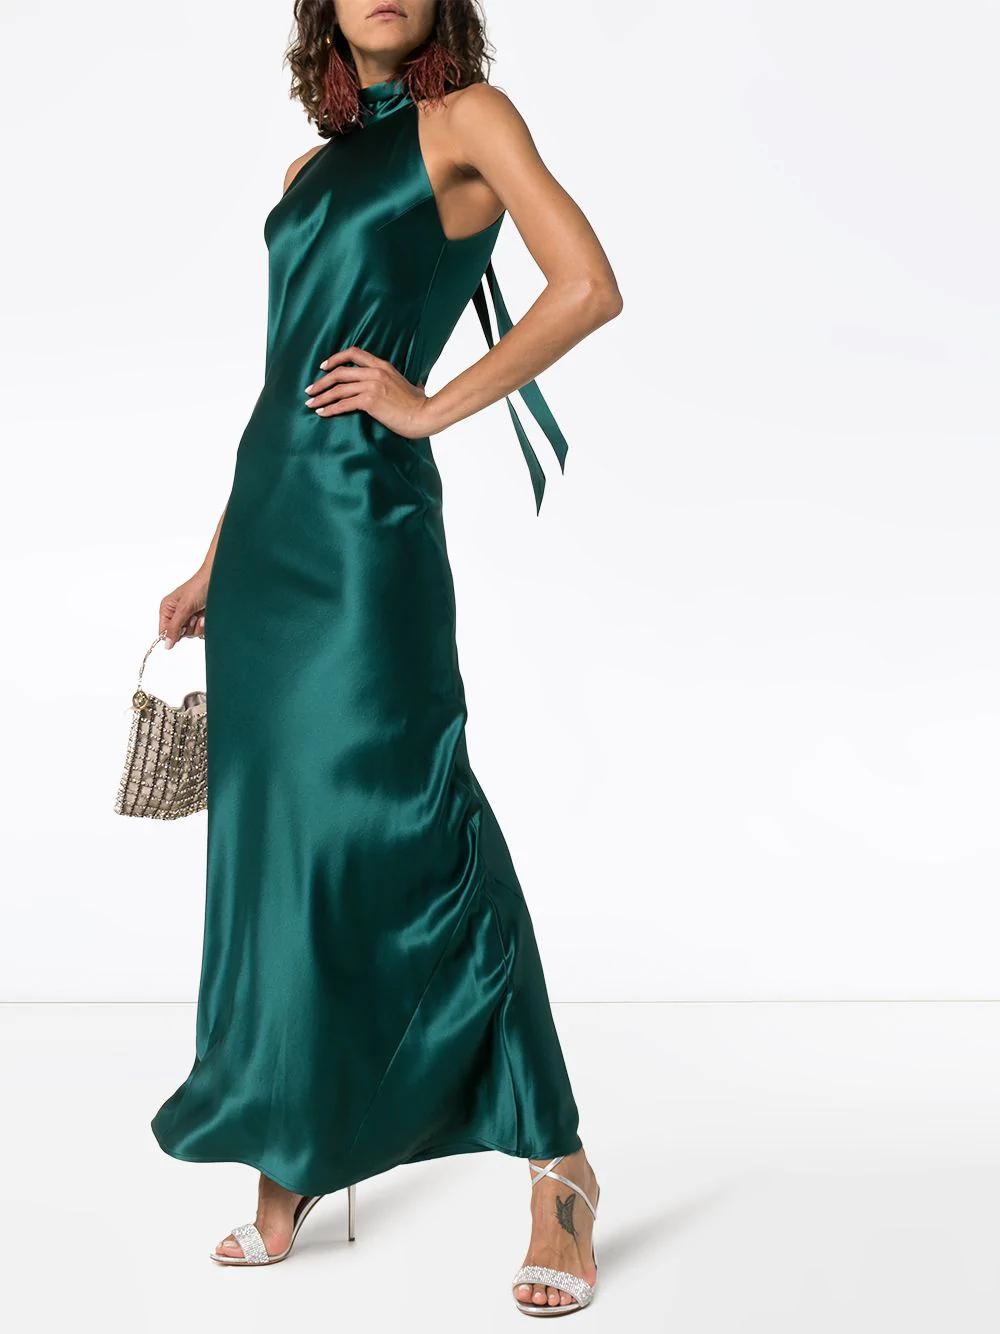 VLabel London Halterneck Maxi Frill Occasion Prom Dress